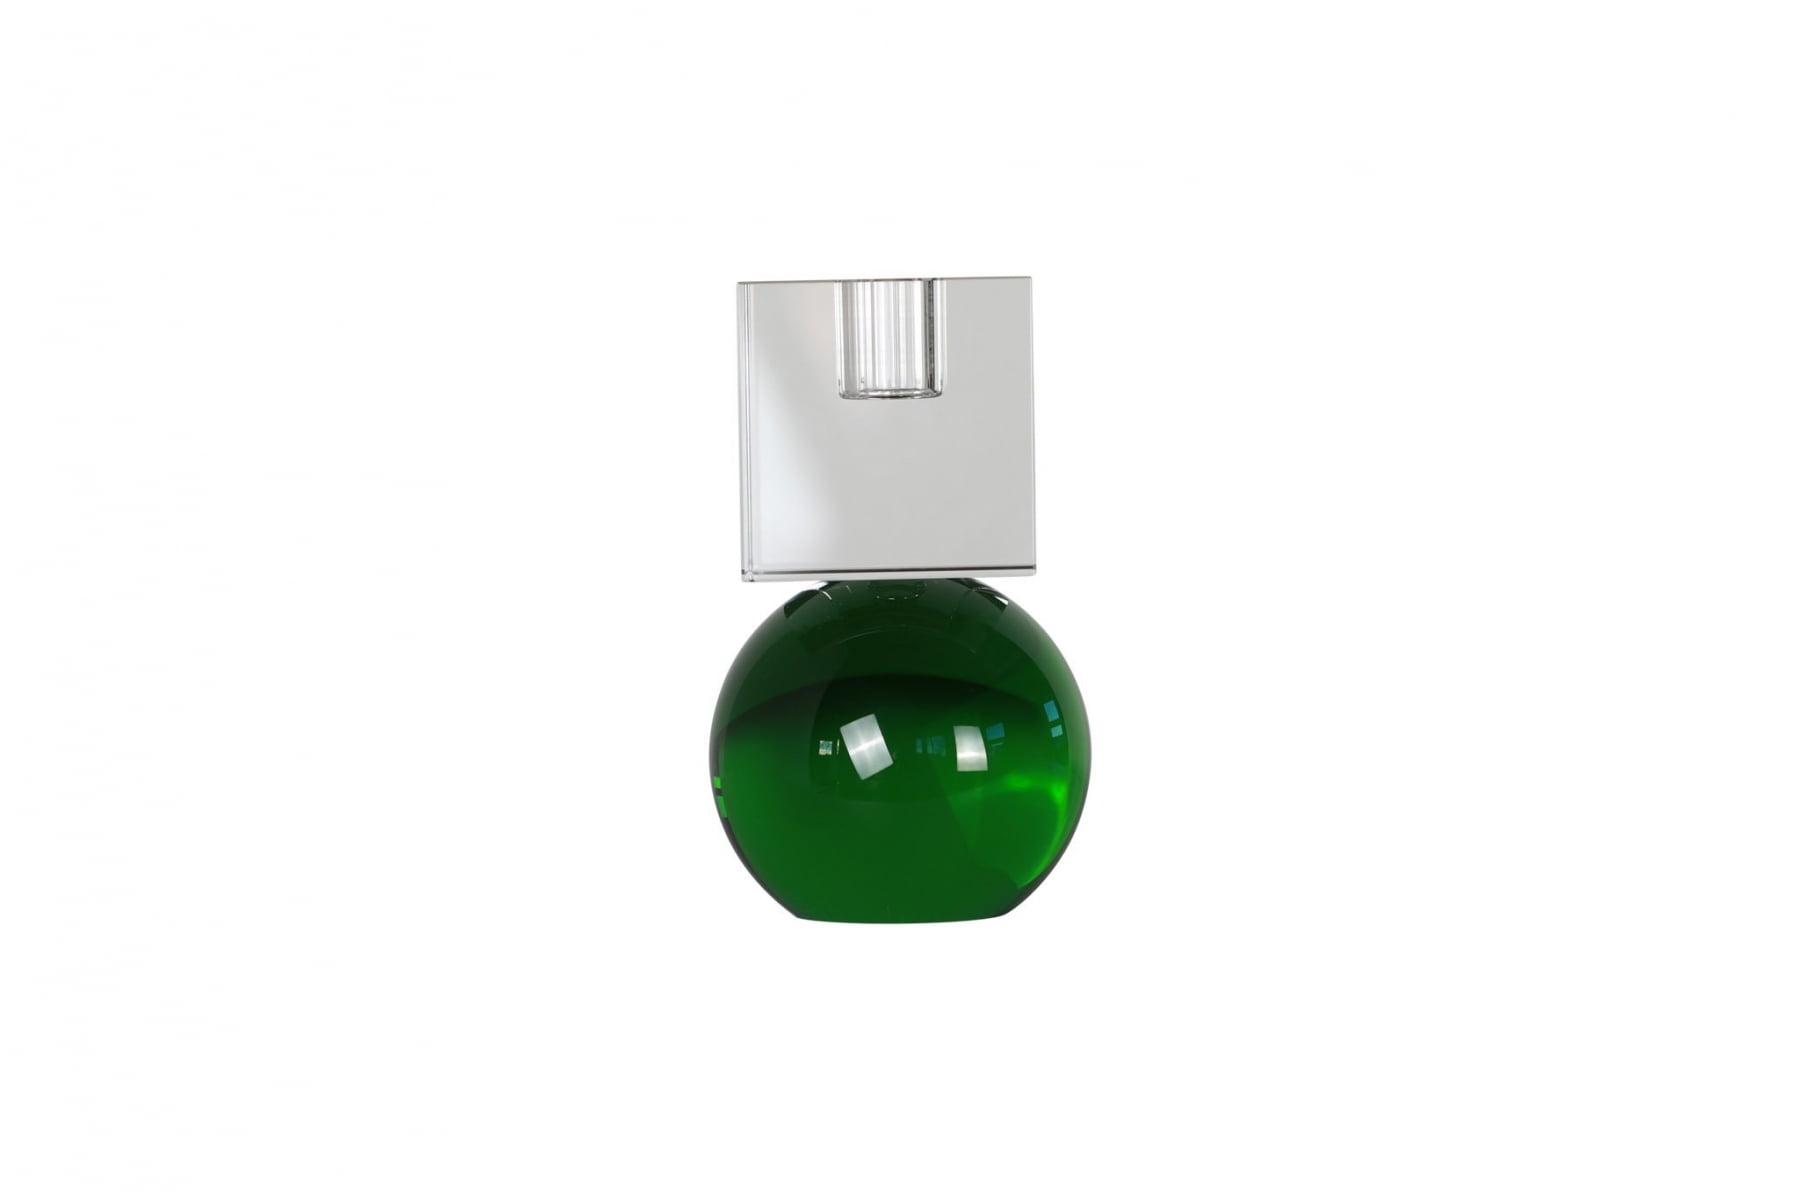 Crystalcolorcrushcleargreen_3500x3500-1800x1200-1.jpg